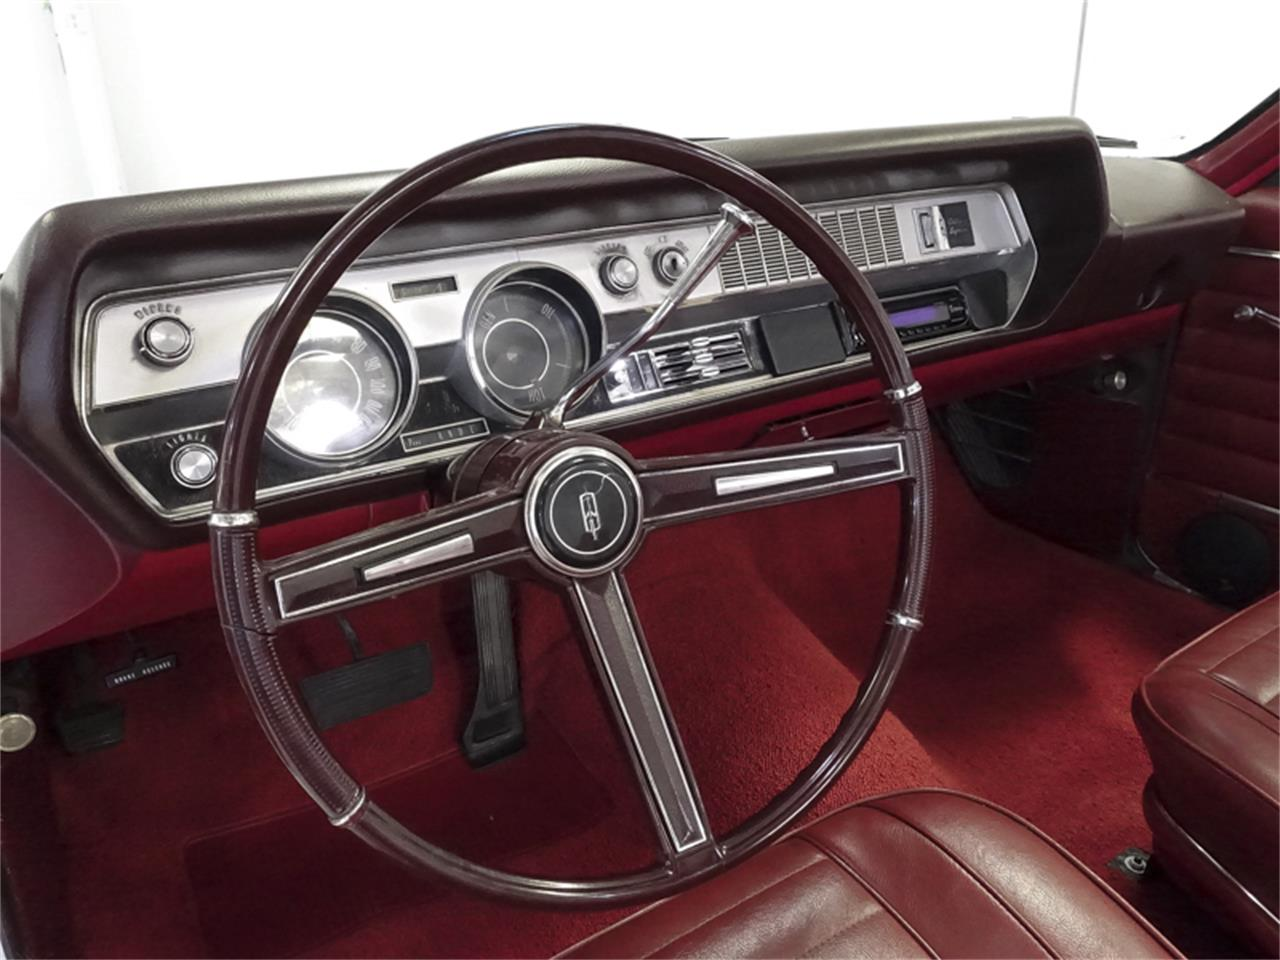 Large Picture of Classic '67 Oldsmobile Cutlass Supreme located in Saint Louis Missouri - $29,900.00 - QK0F